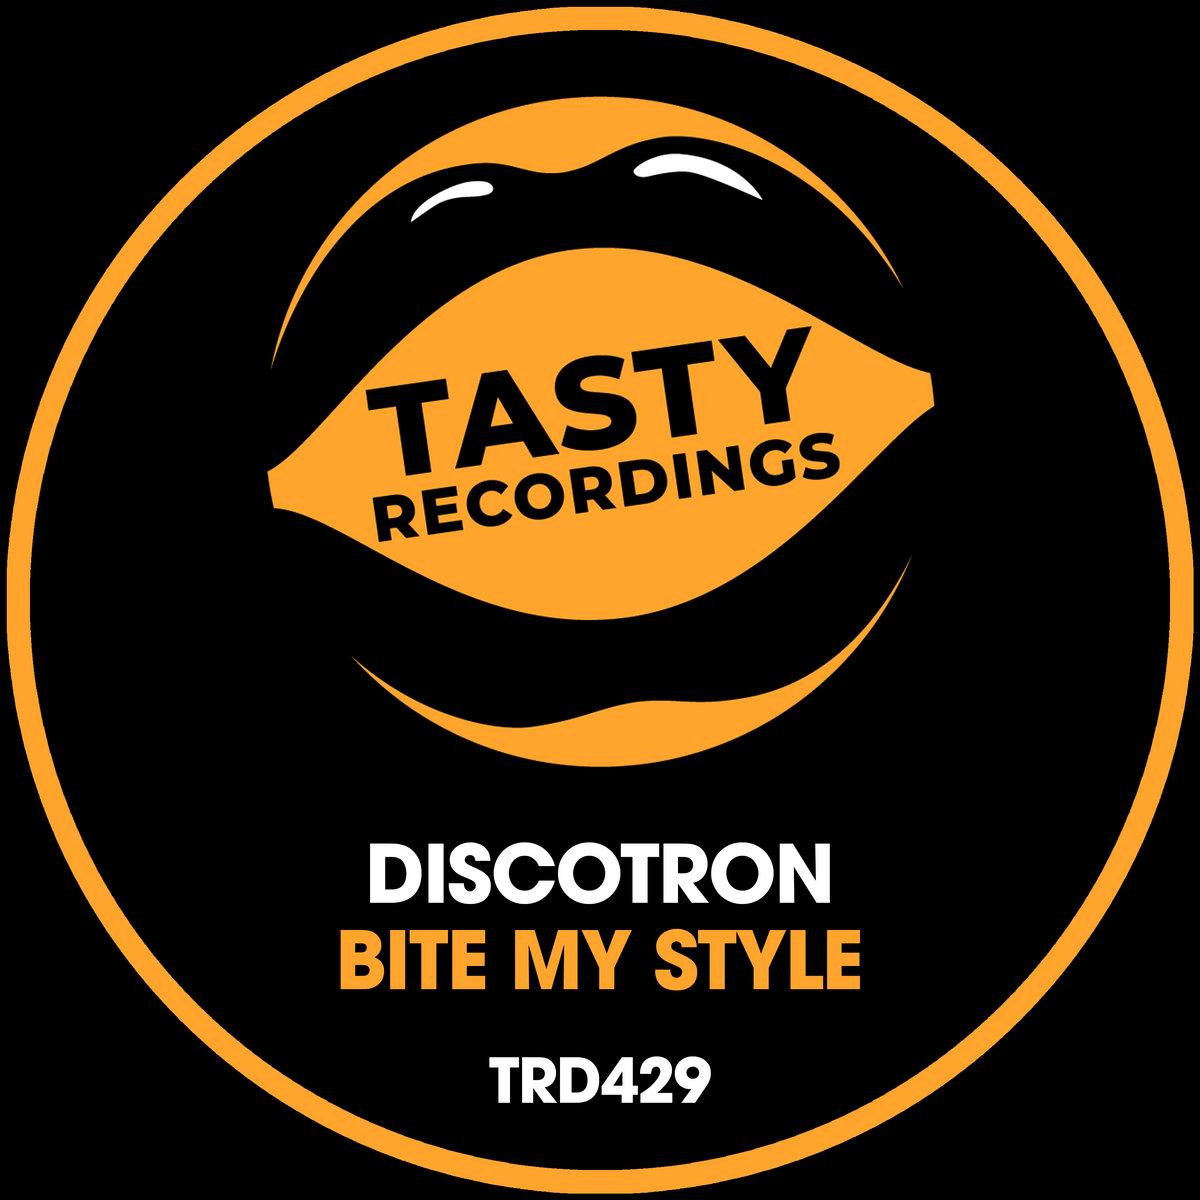 Bite My Style | Discotron